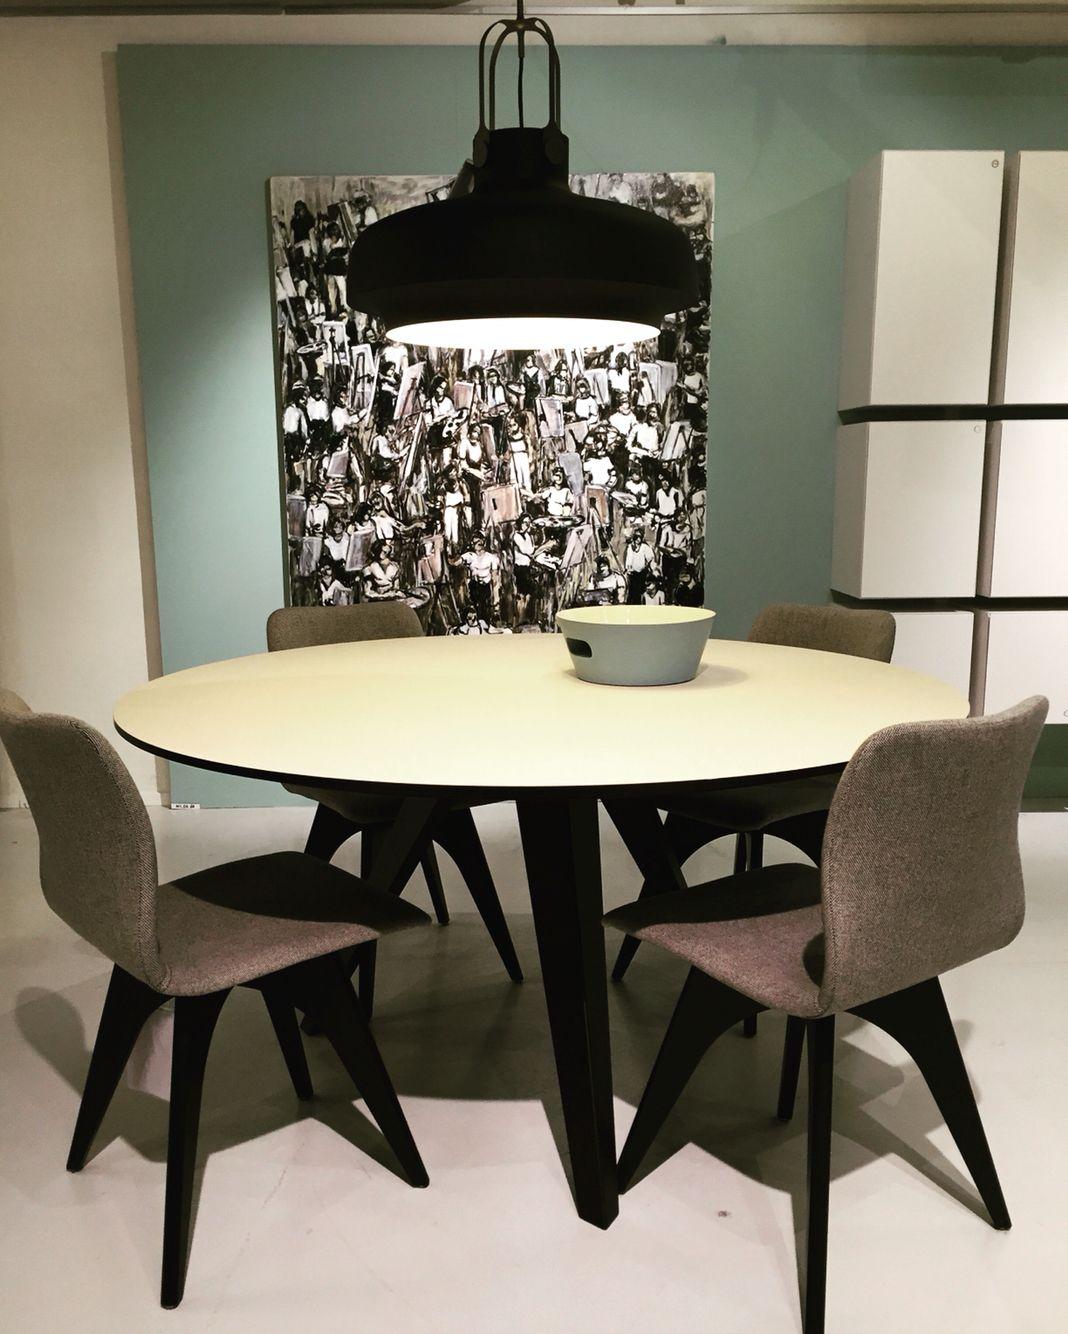 Dutch Design | Odesi Belly Table | Design tafel | Odesi Wave